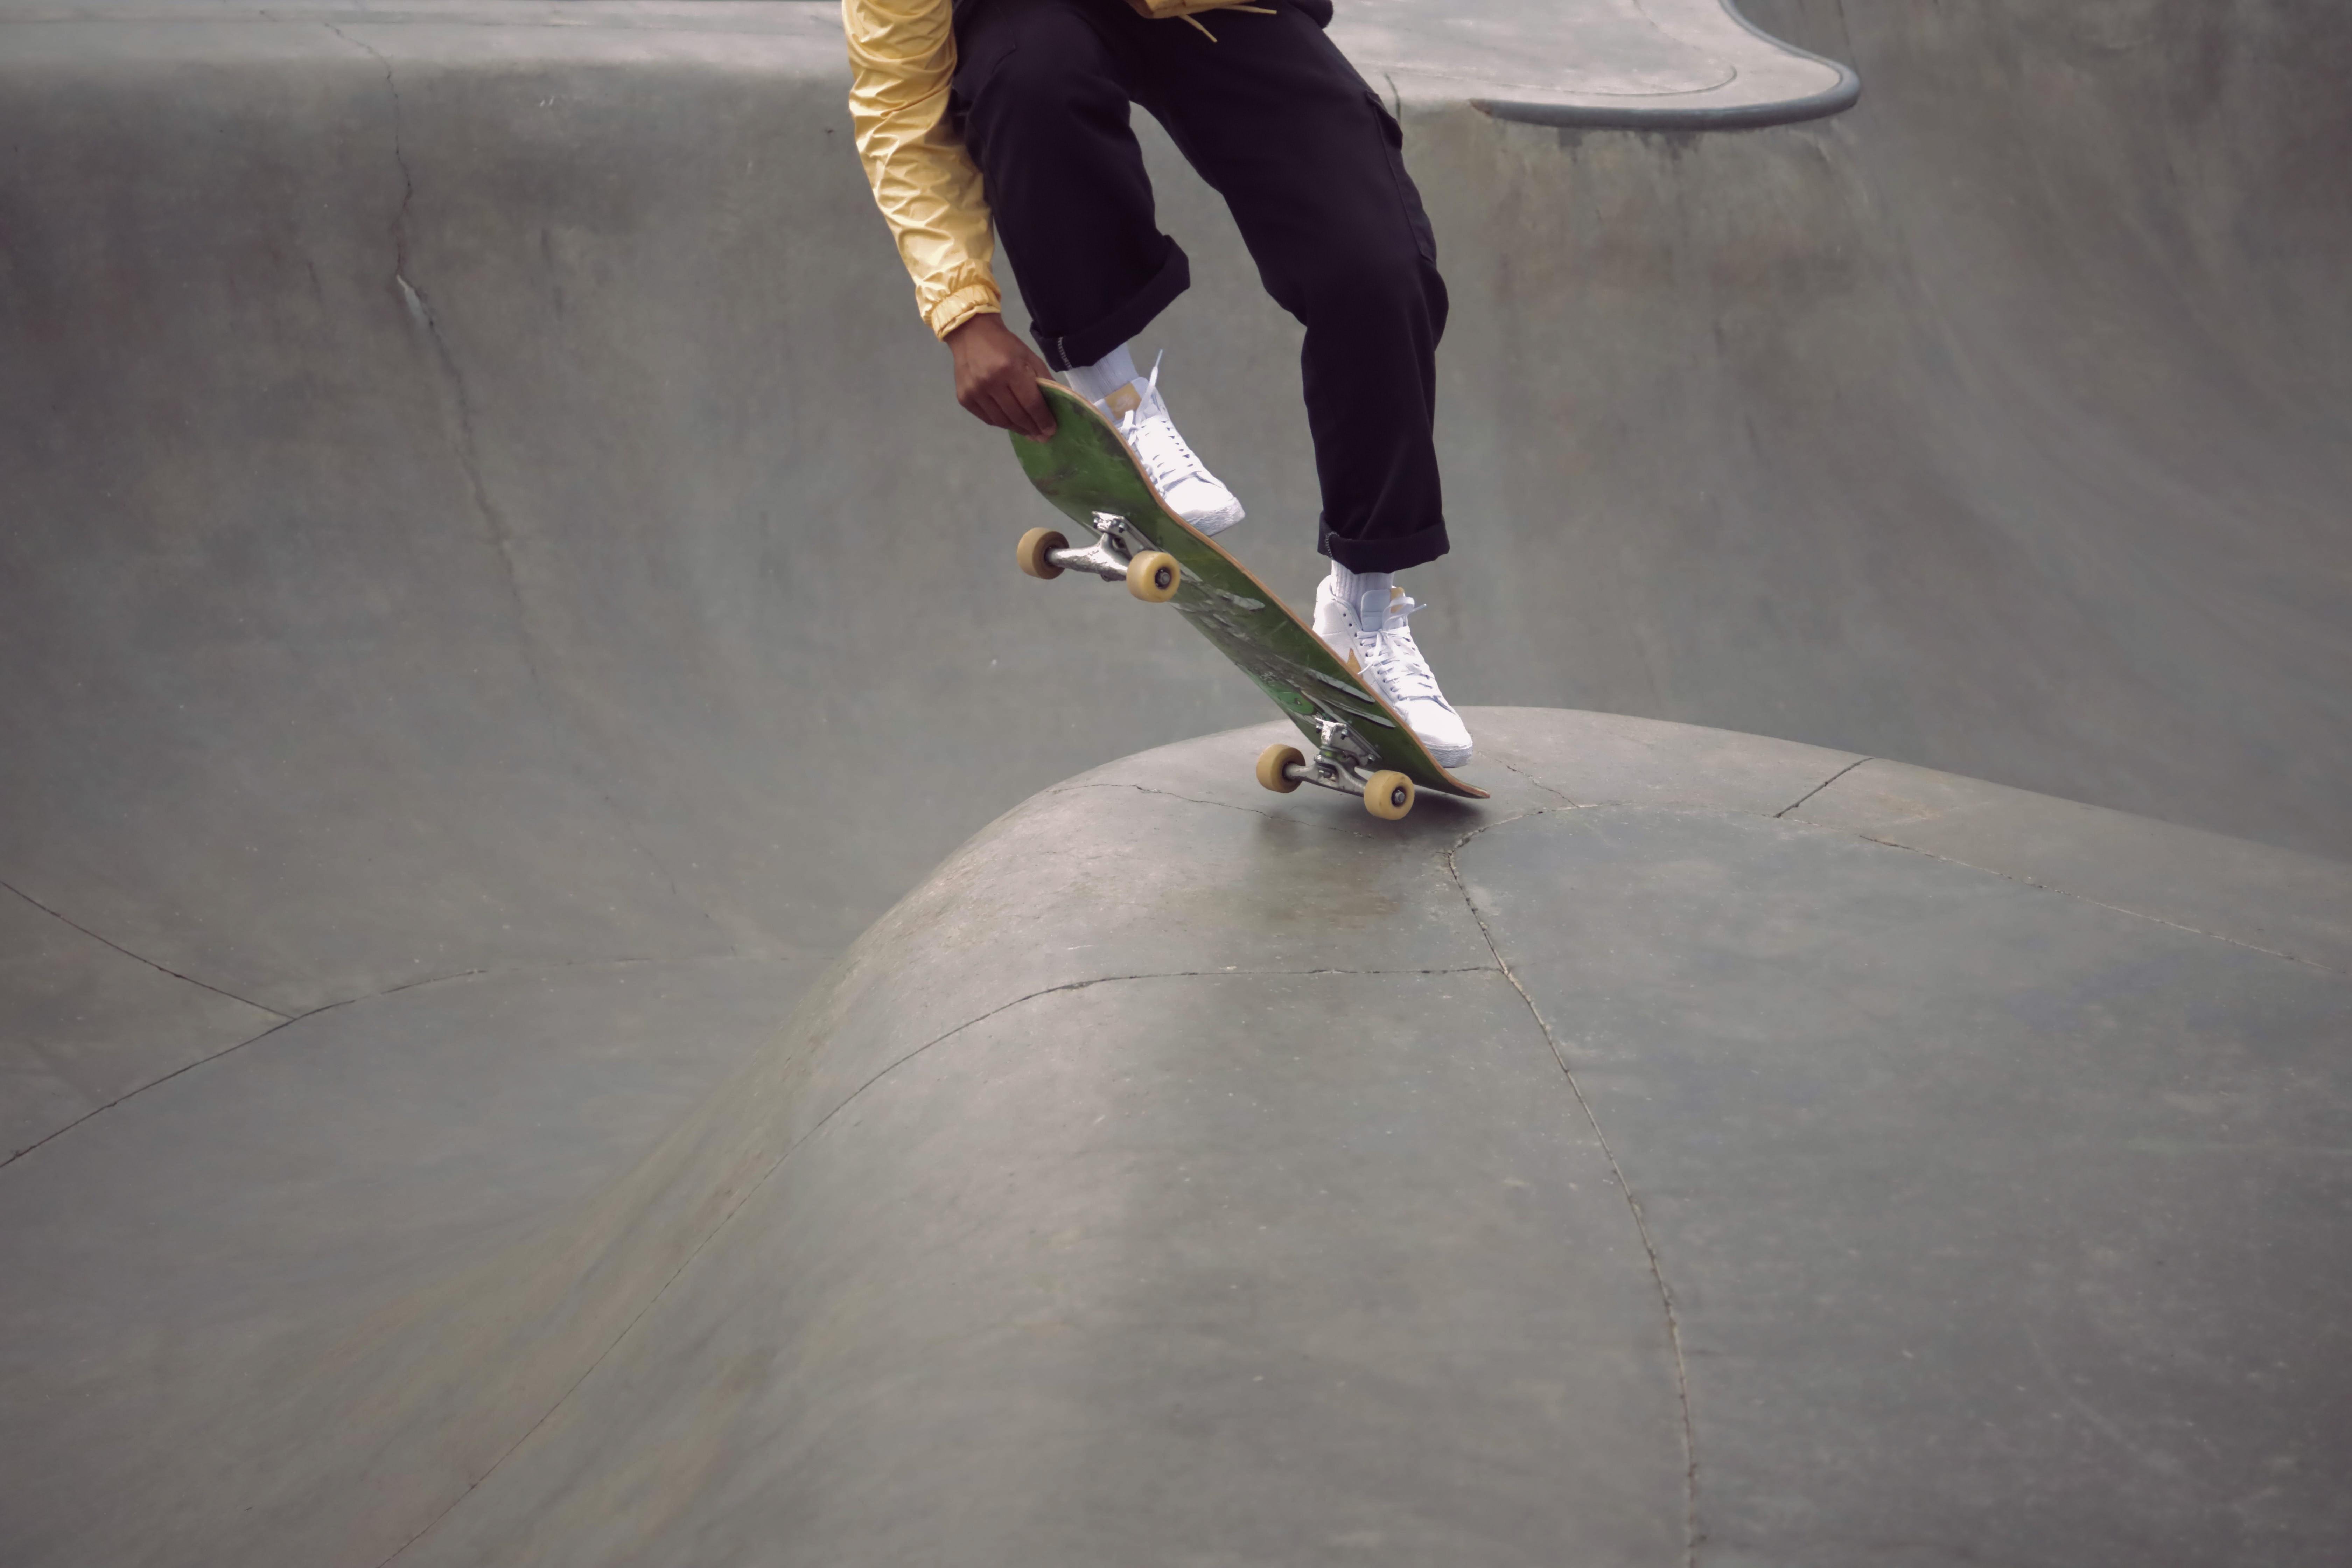 70234 скачать обои Спорт, Скейтер, Скейтборд, Скейт, Трюк, Экстрим - заставки и картинки бесплатно